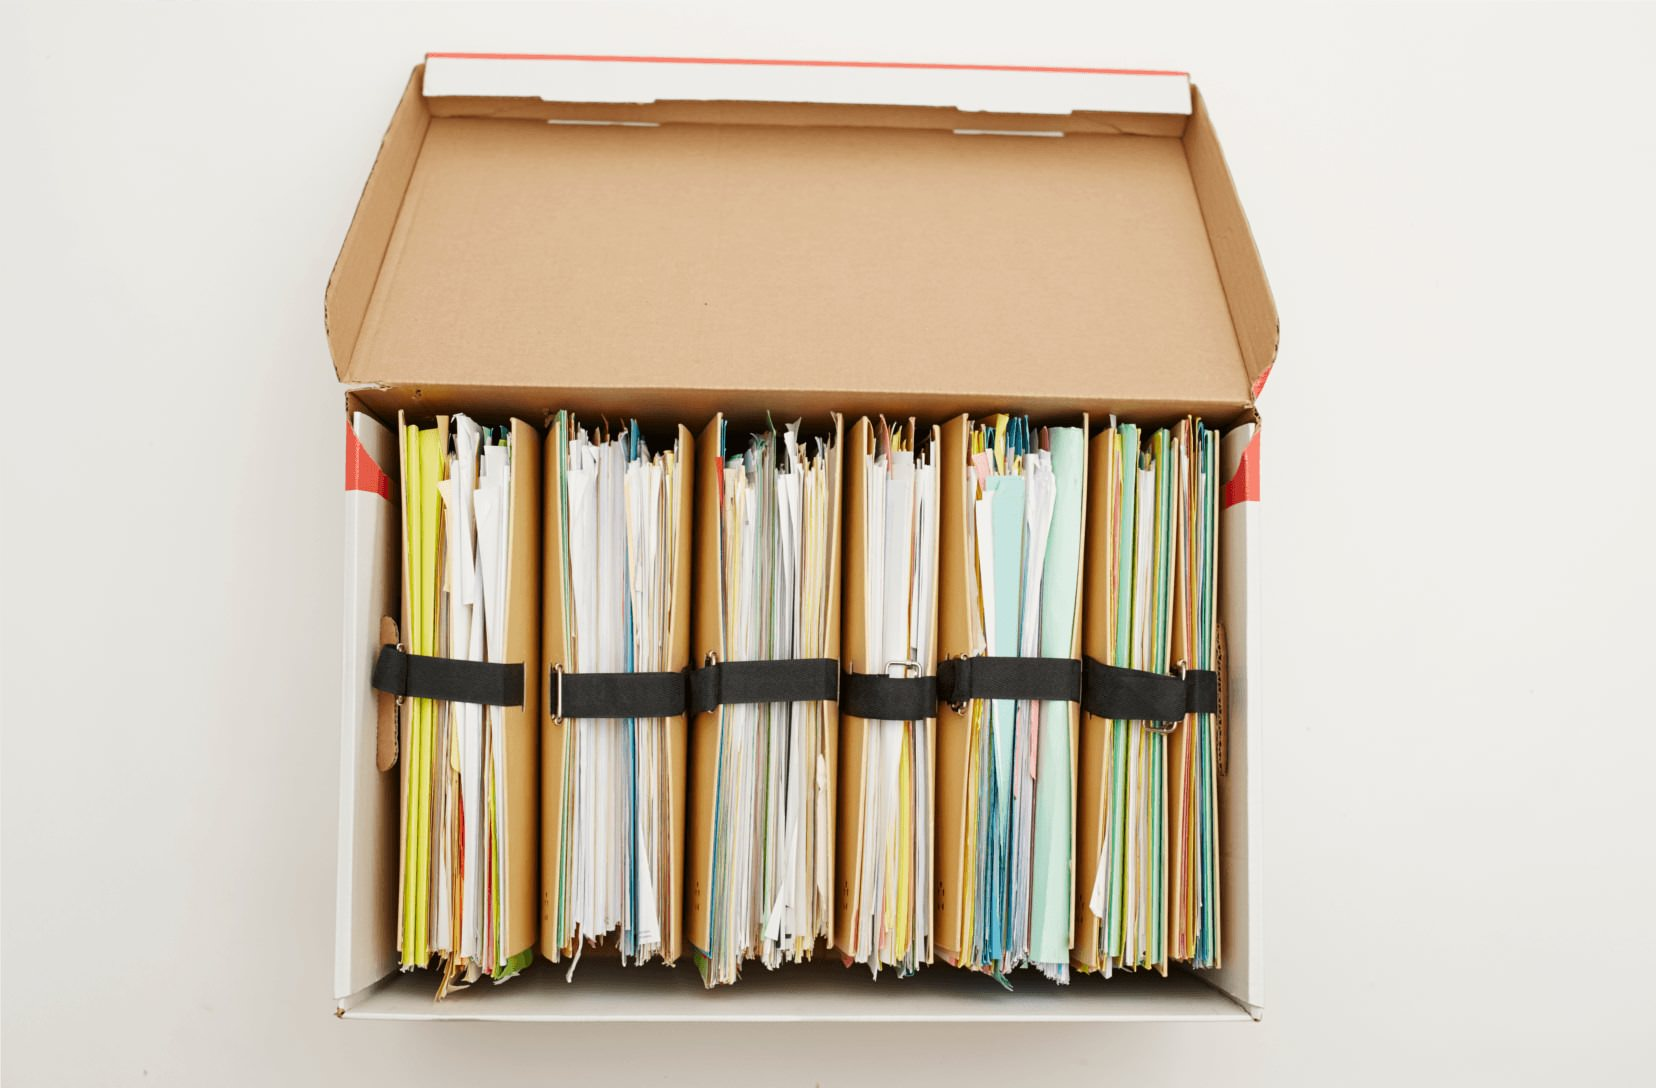 Wesquare-archivage-start-up-paris-blue-box-stockage-effronte-archivbox_mini